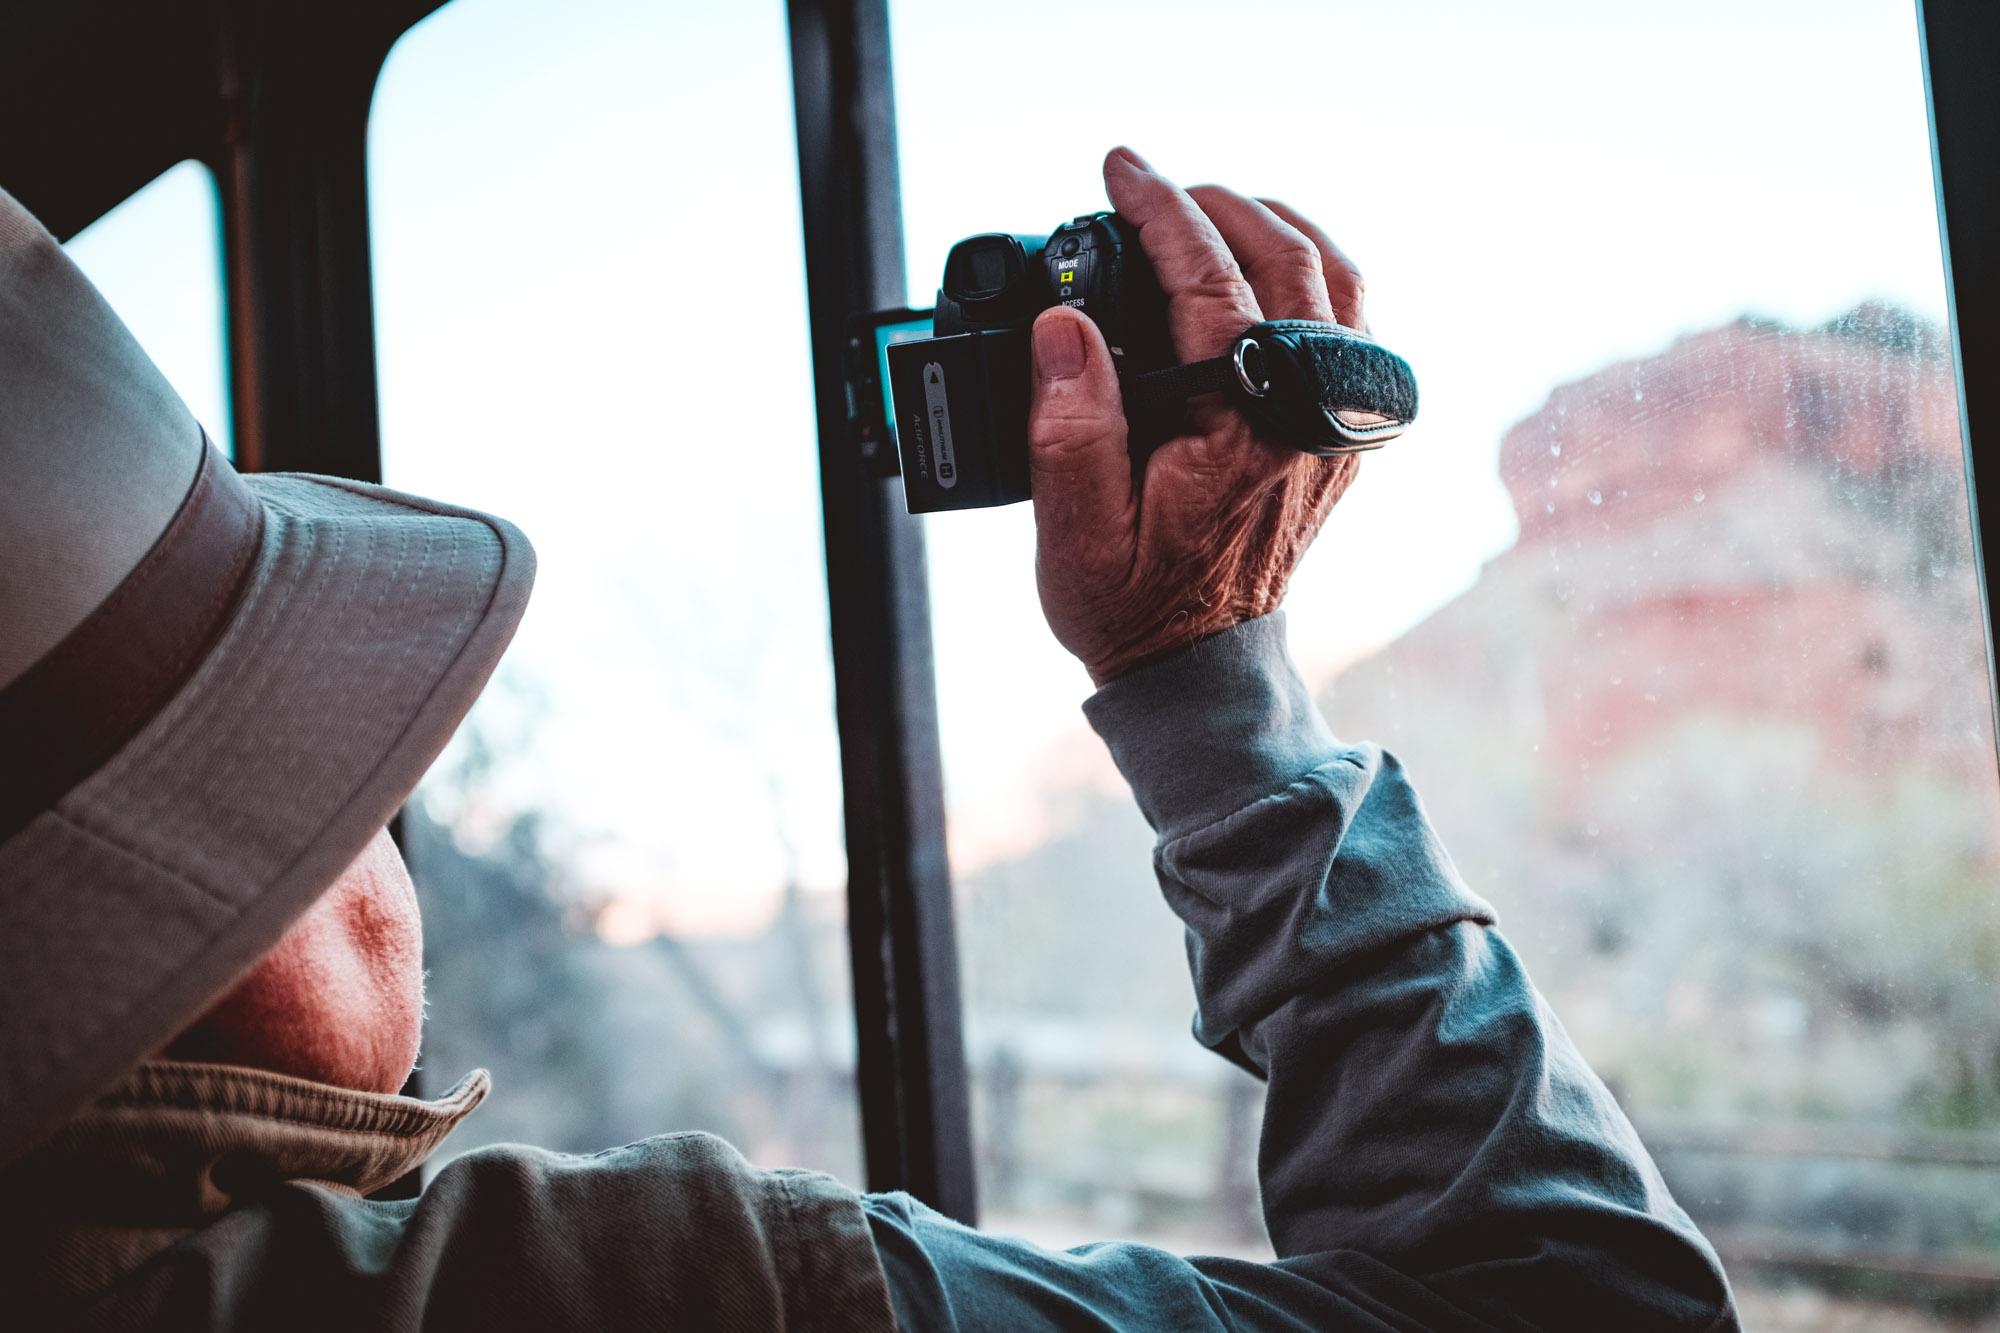 old-man-camera-zion-national-park-utah